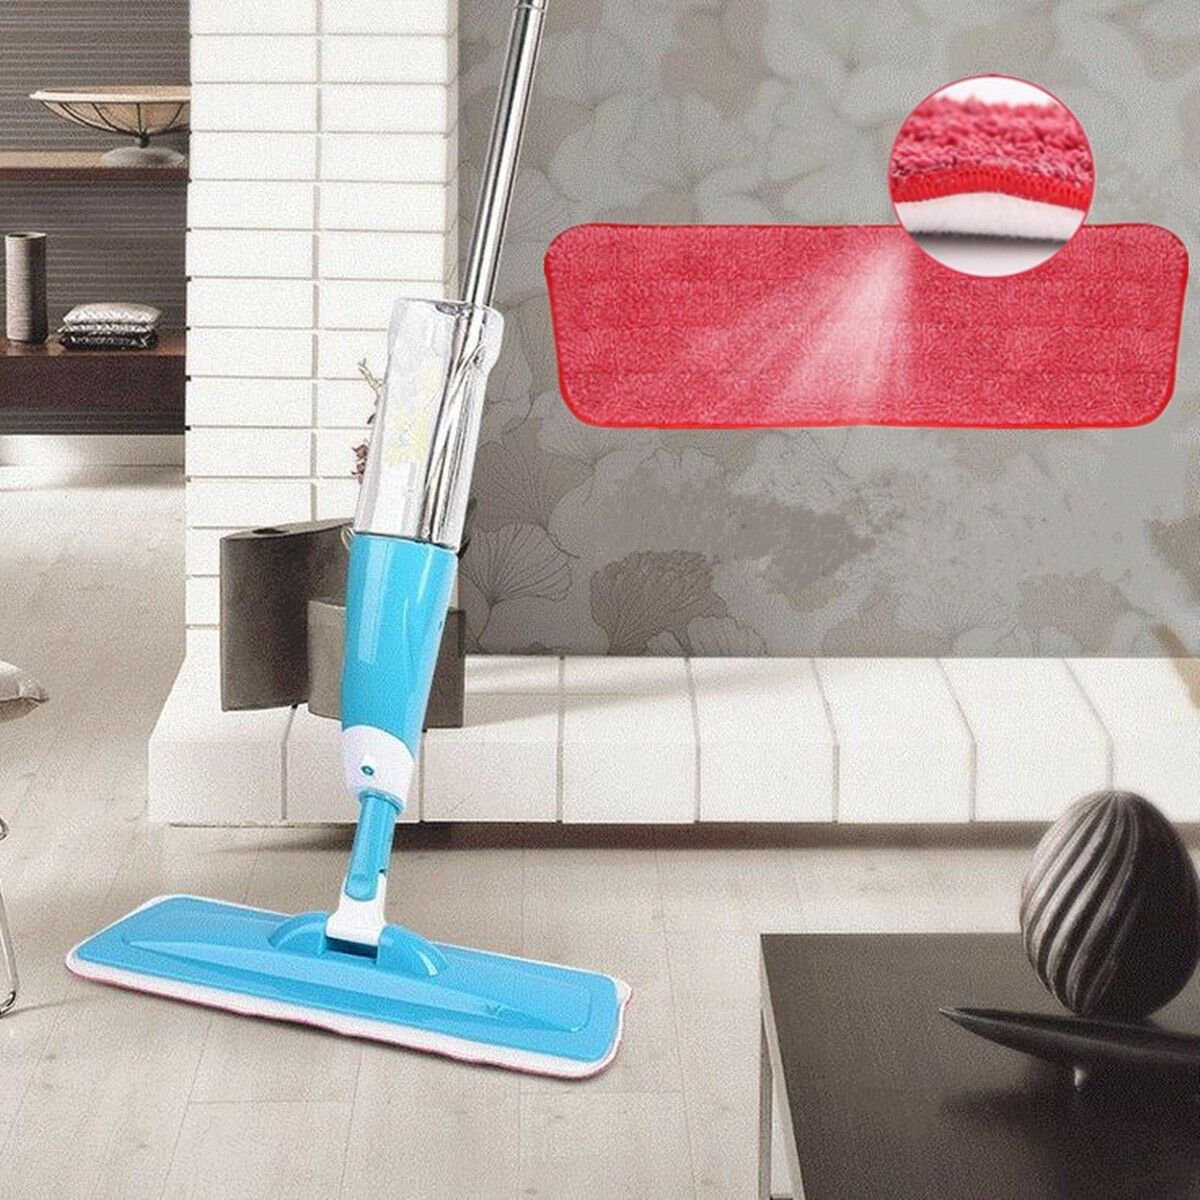 Water Spray Household Flat Mop Floor Cleaner 360 Spin Head w